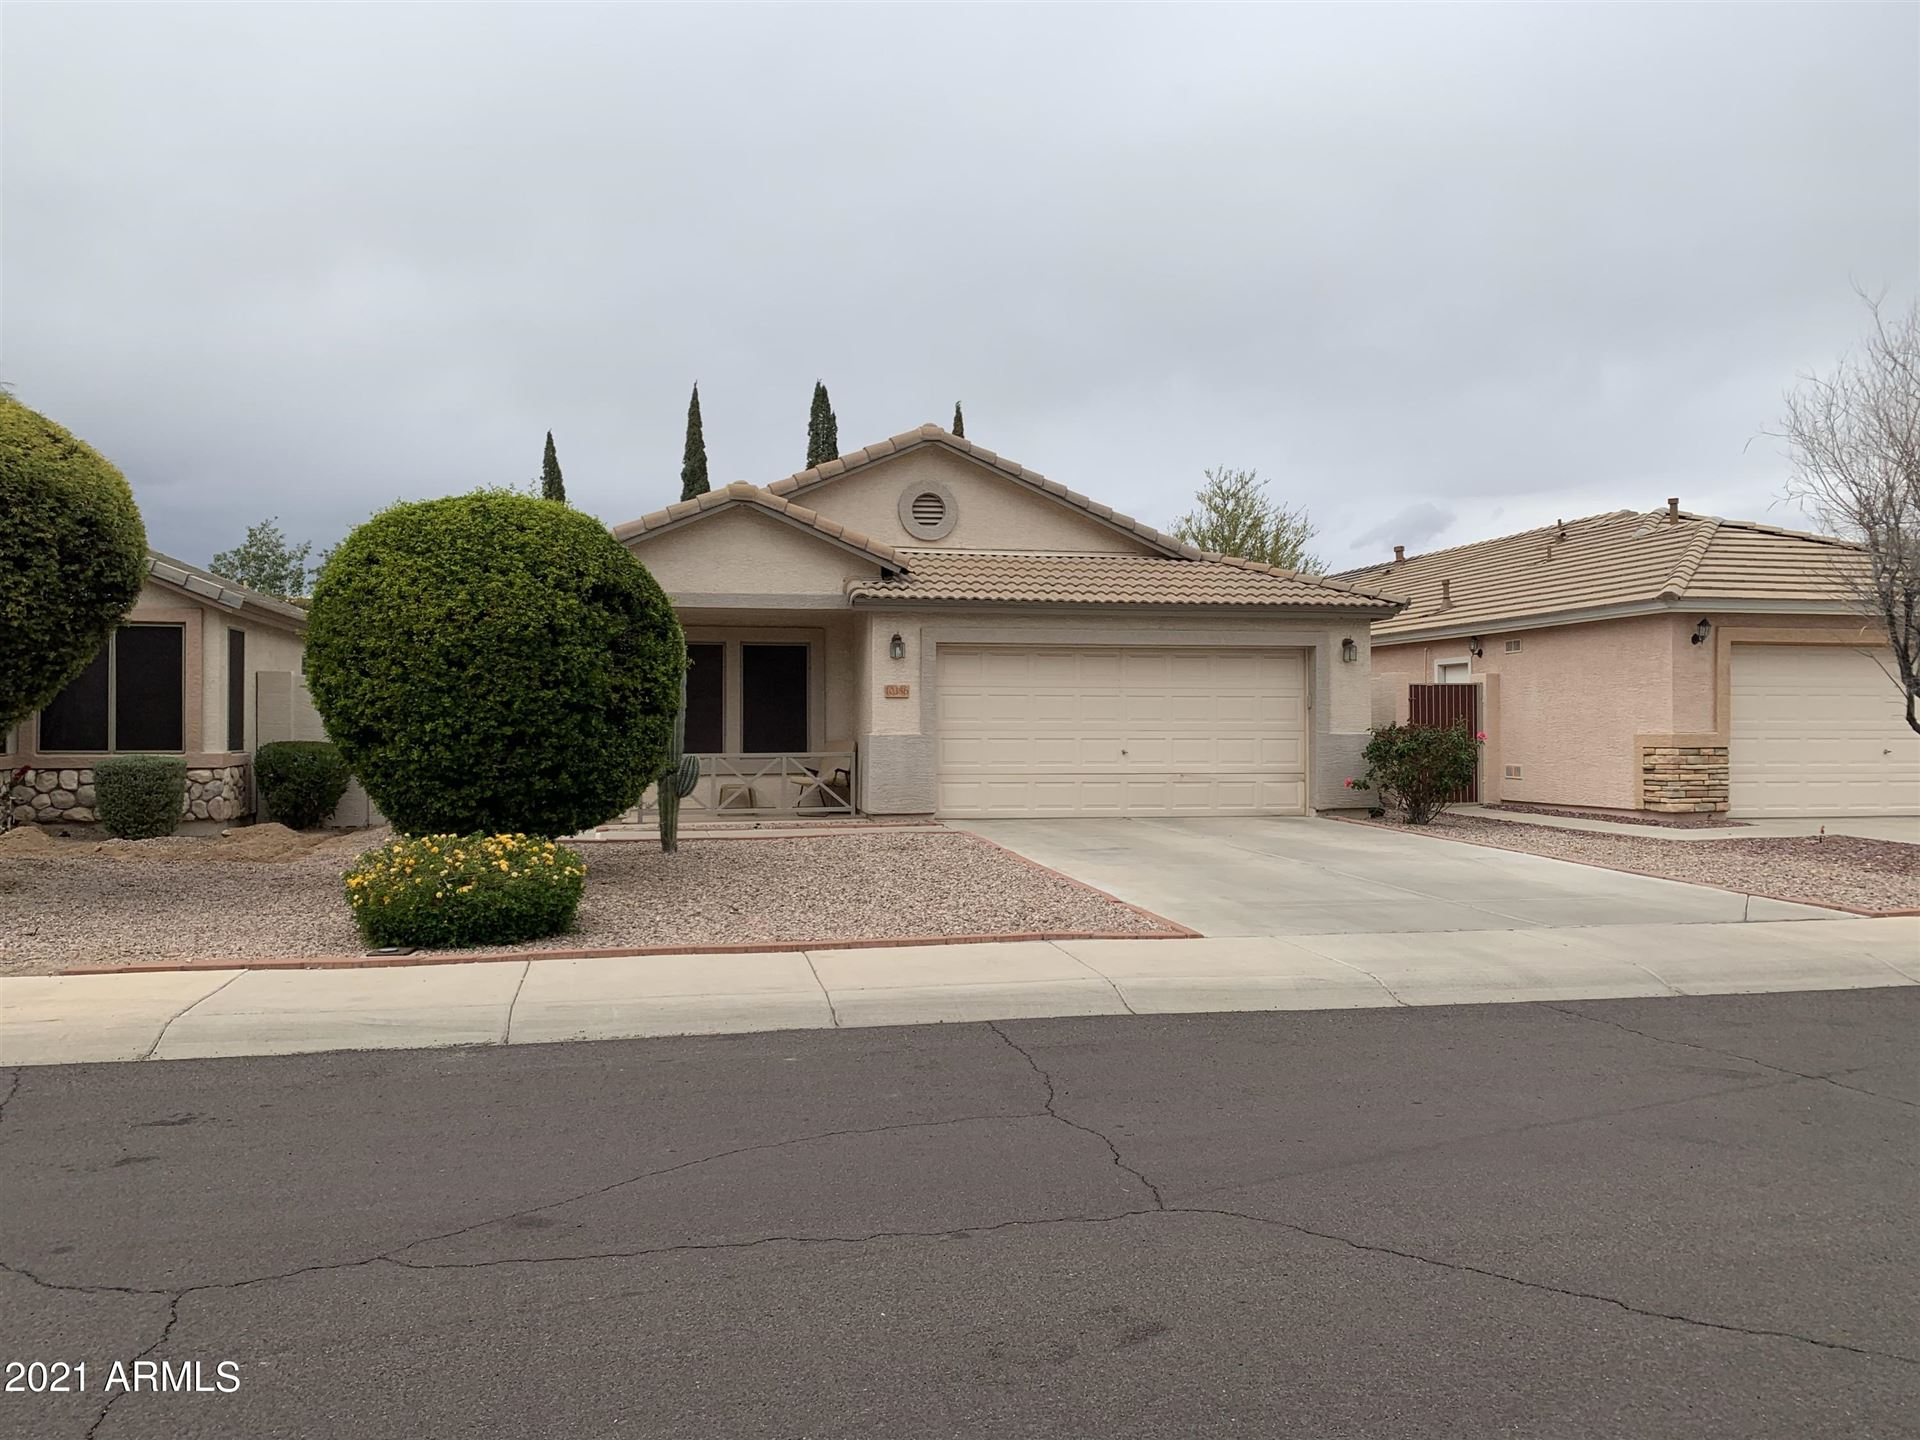 10386 W RUNION Drive, Peoria, AZ 85382 - MLS#: 6204050